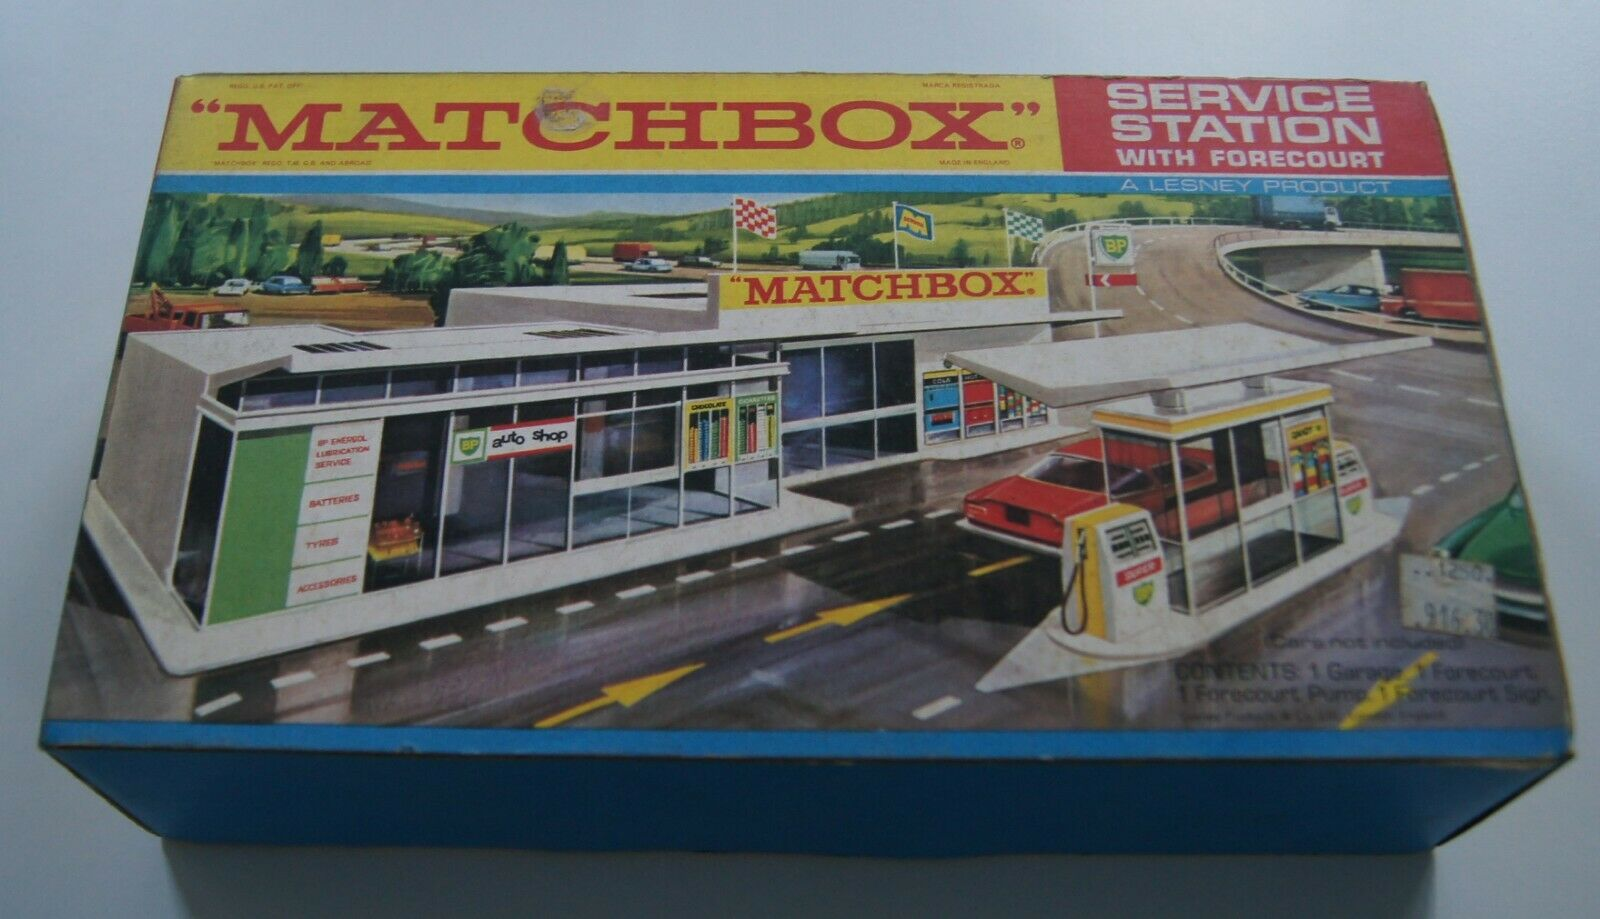 MATCHBOX GARAGE STATION SERVICE BP MG1 ANNEES 70 NEUF EN BOITE